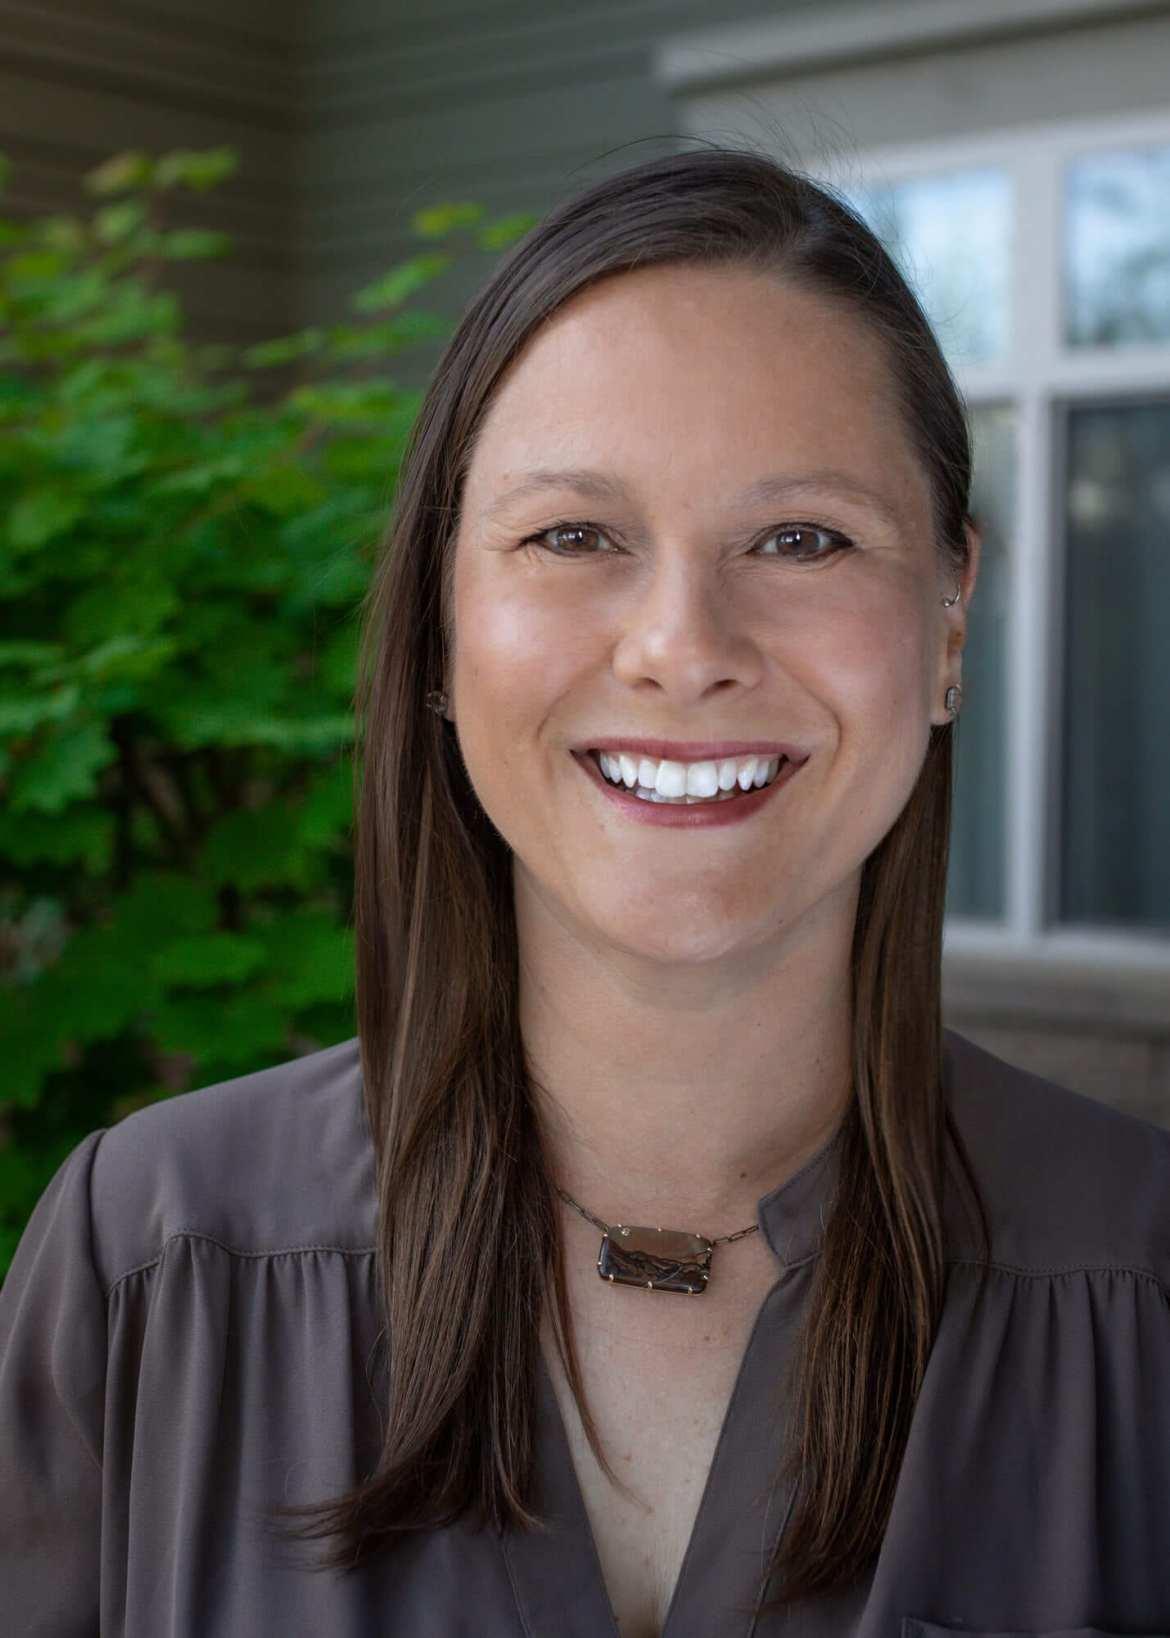 Dermatology PA Jill Conway, PA-C